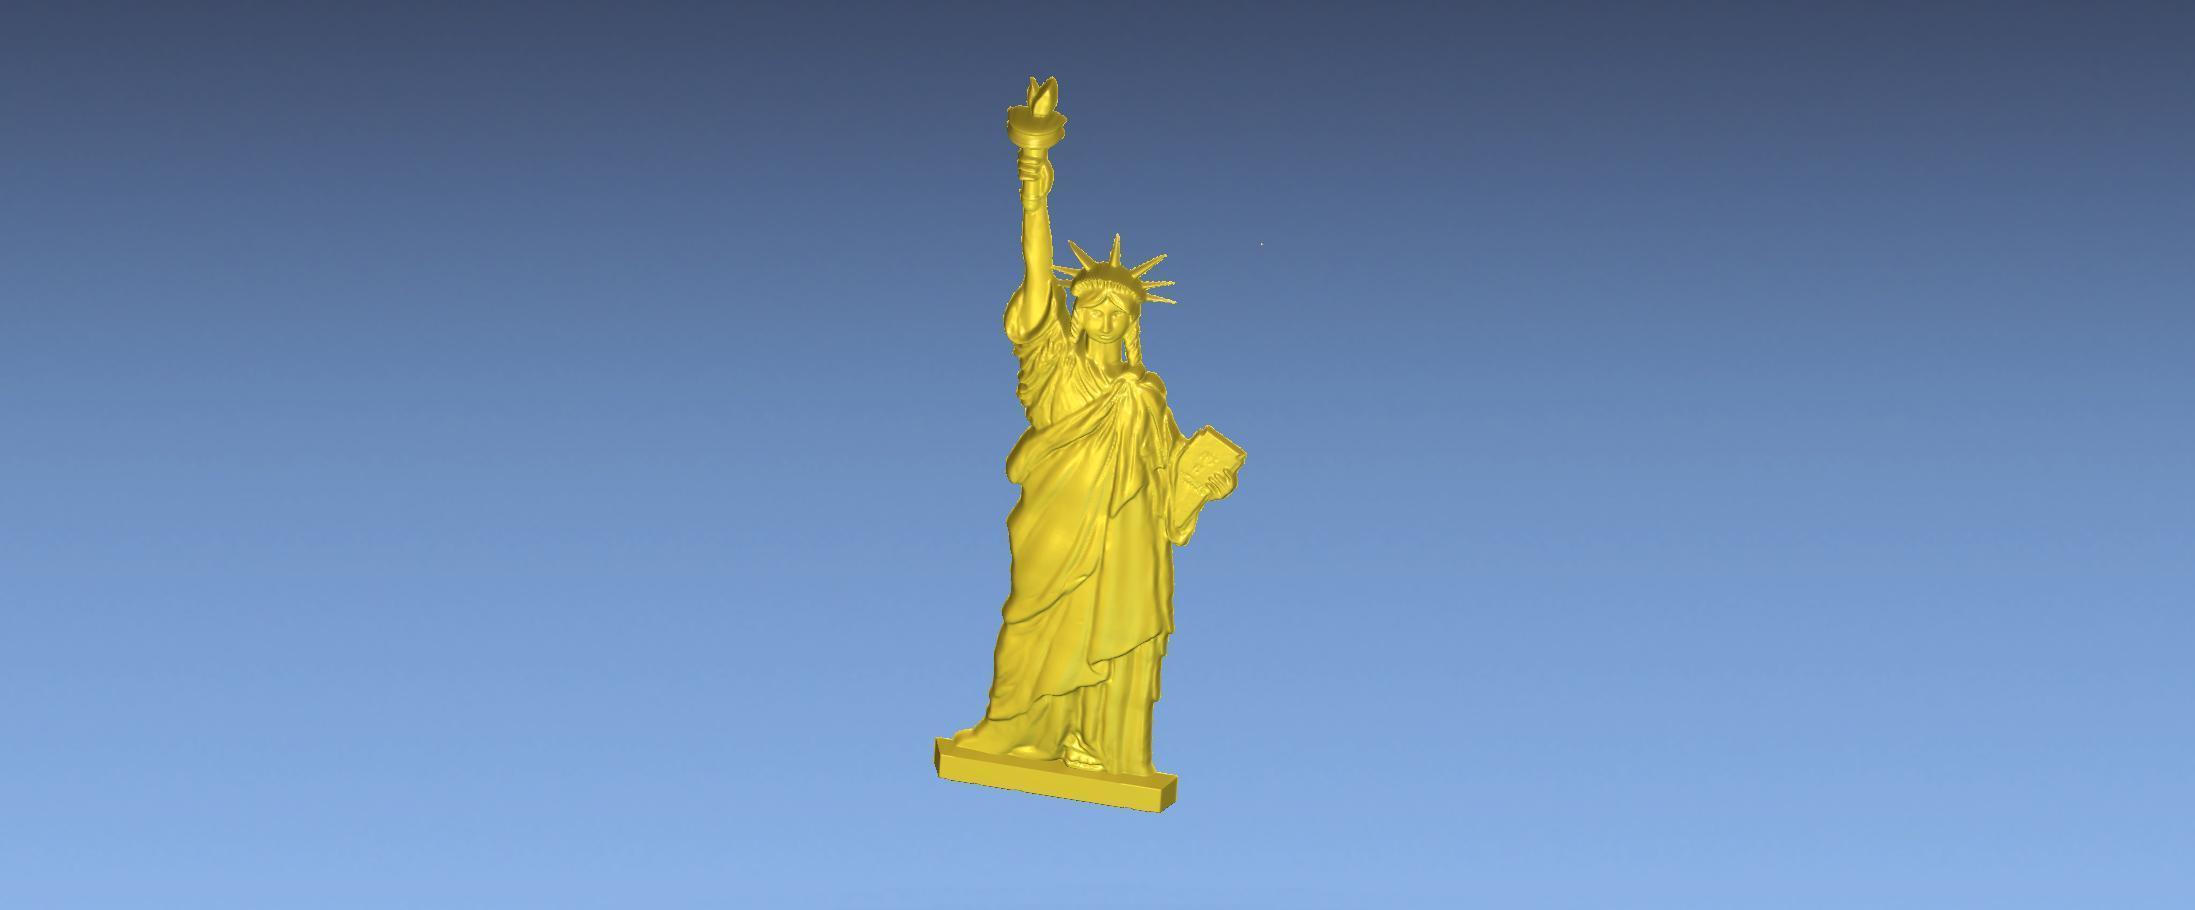 4.jpg Download free STL file LIBRETY STATUE 3D STL FILE • 3D printing design, ALPHA_MENA